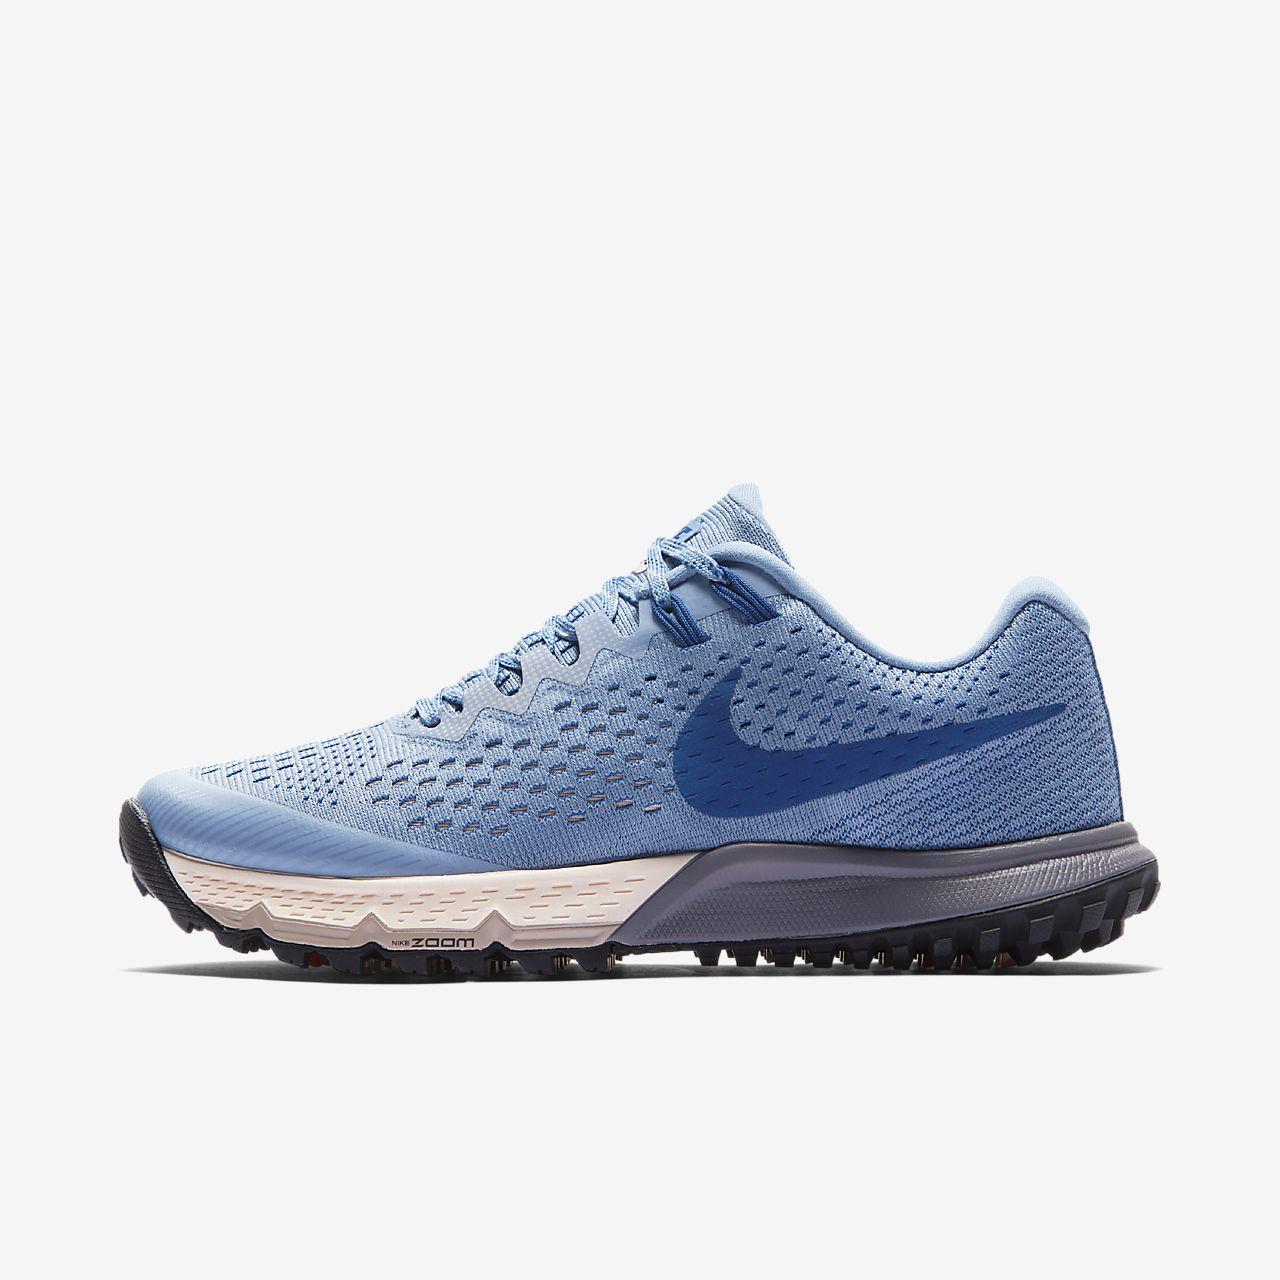 promo code 6266b 3364b Calzado de running para mujer Nike Air Zoom Terra Kiger 4